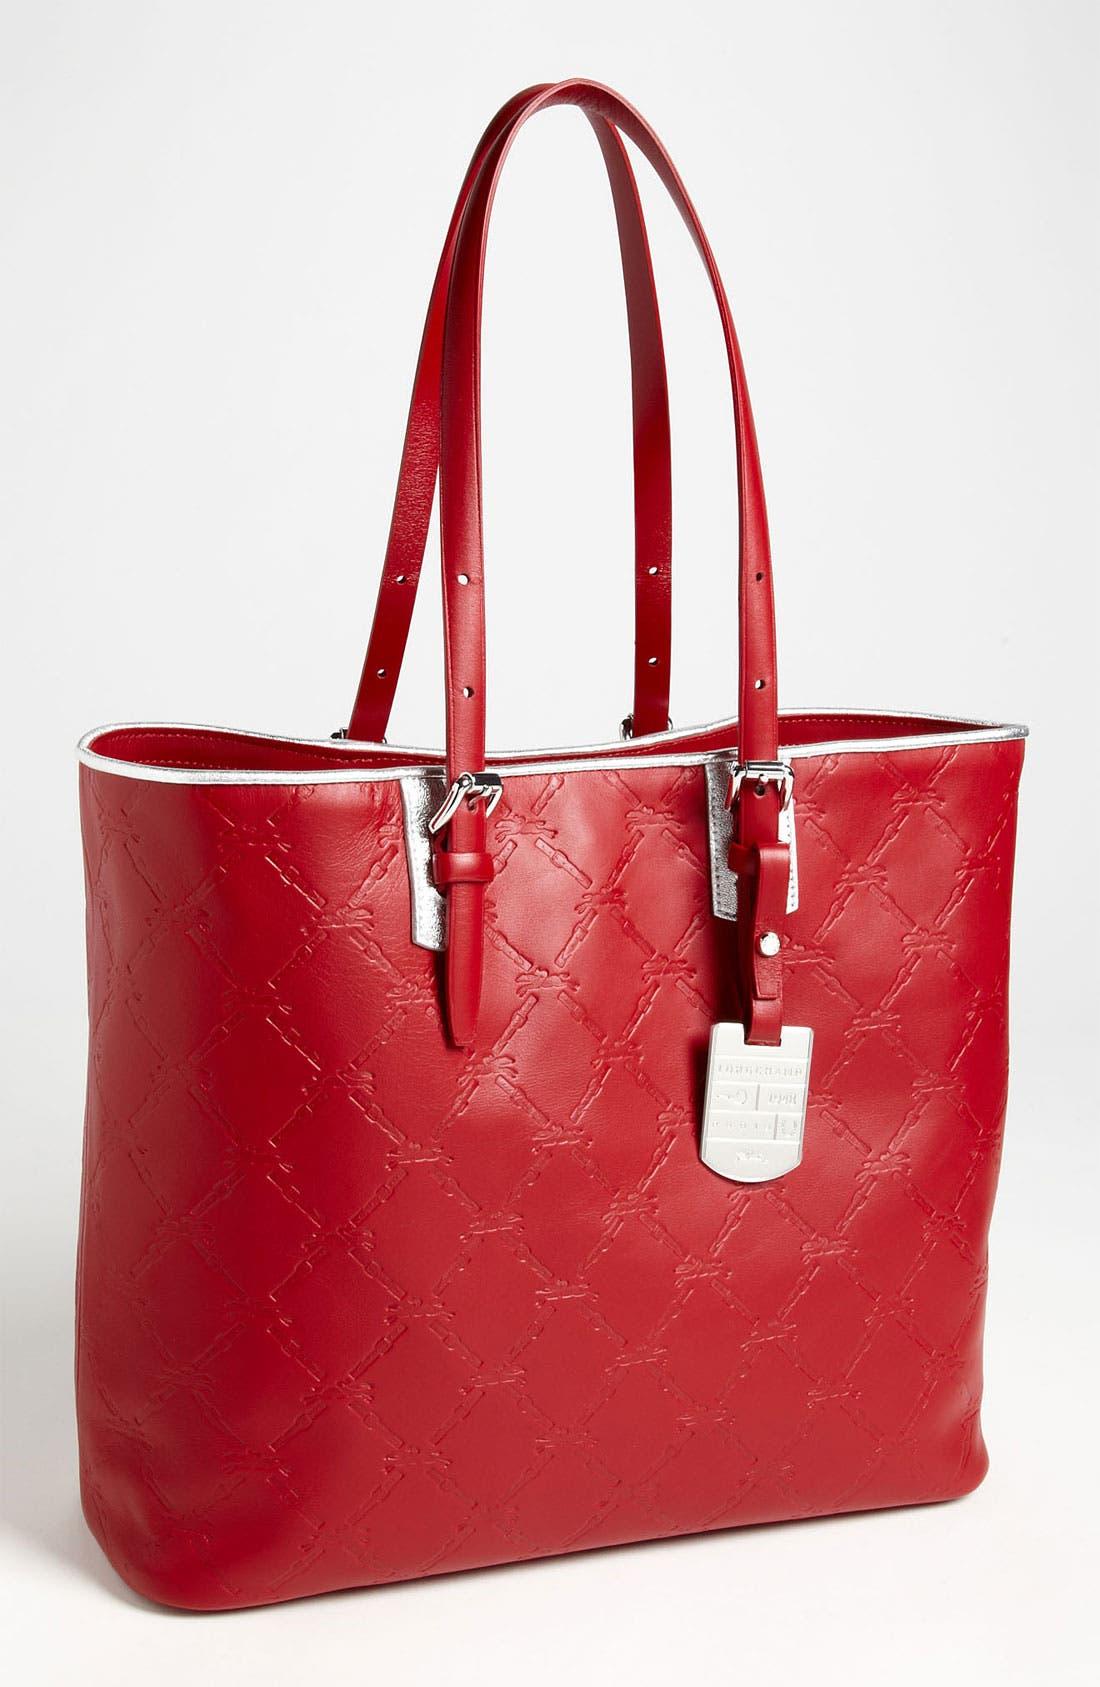 Alternate Image 1 Selected - Longchamp 'LM Cuir - Medium' Shoulder Tote